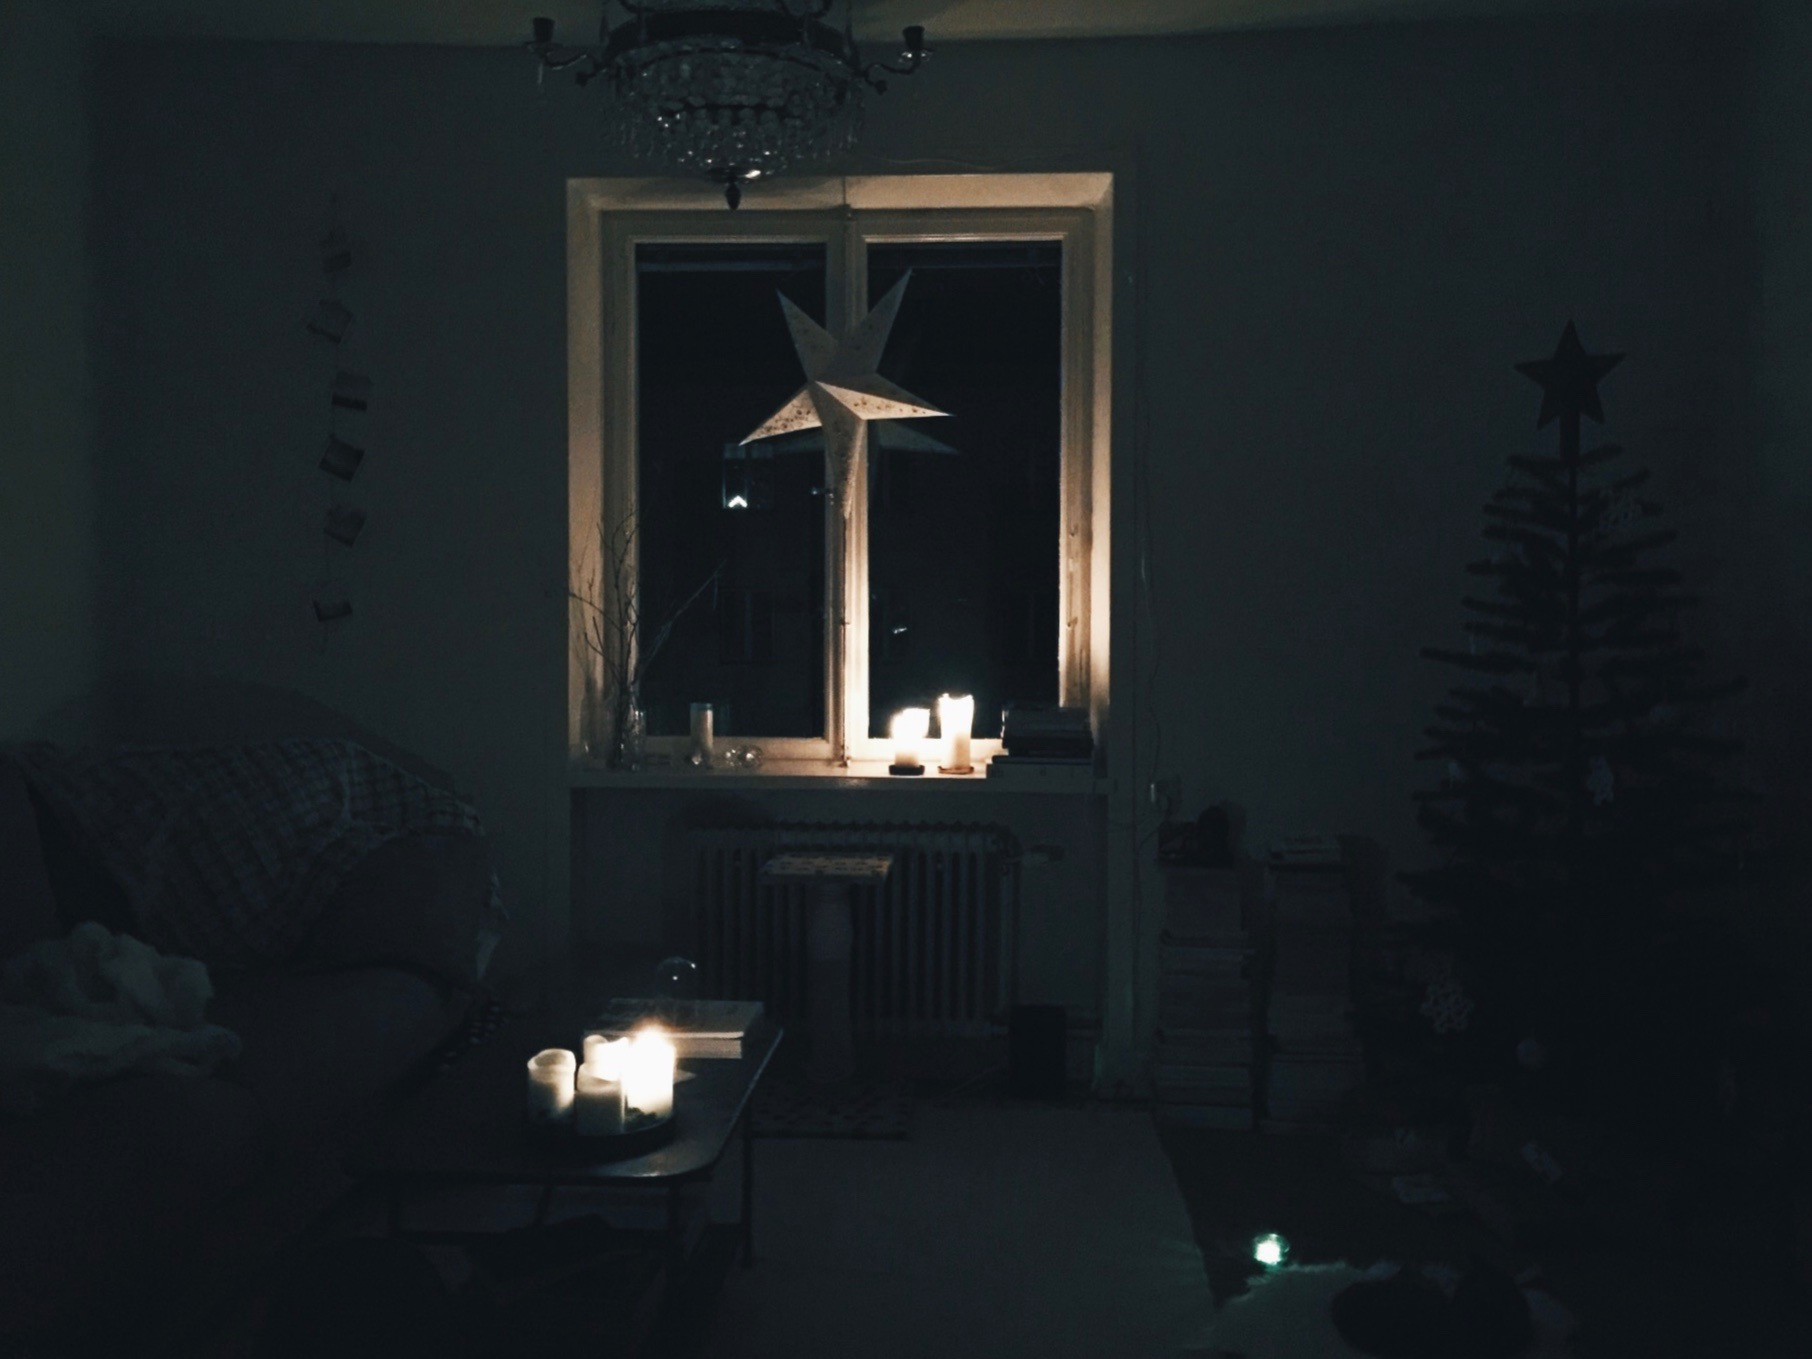 solstice meditation darkness home